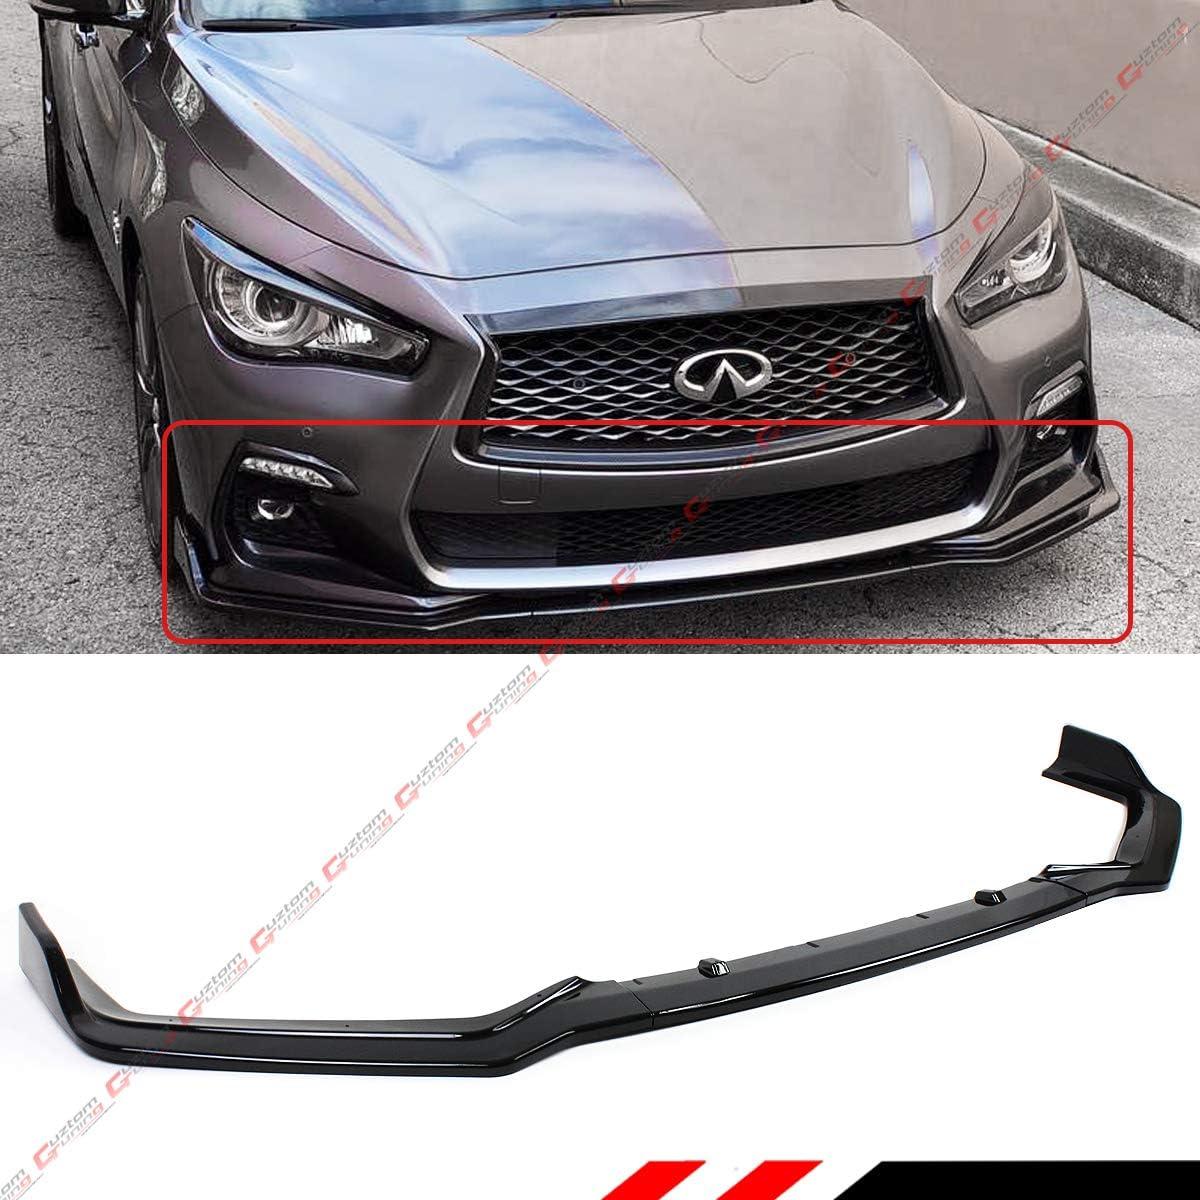 Fits For 2018-2019 Infiniti Q50 Base Premium Glossy Black Front Bumper Lip Spoiler Splitter